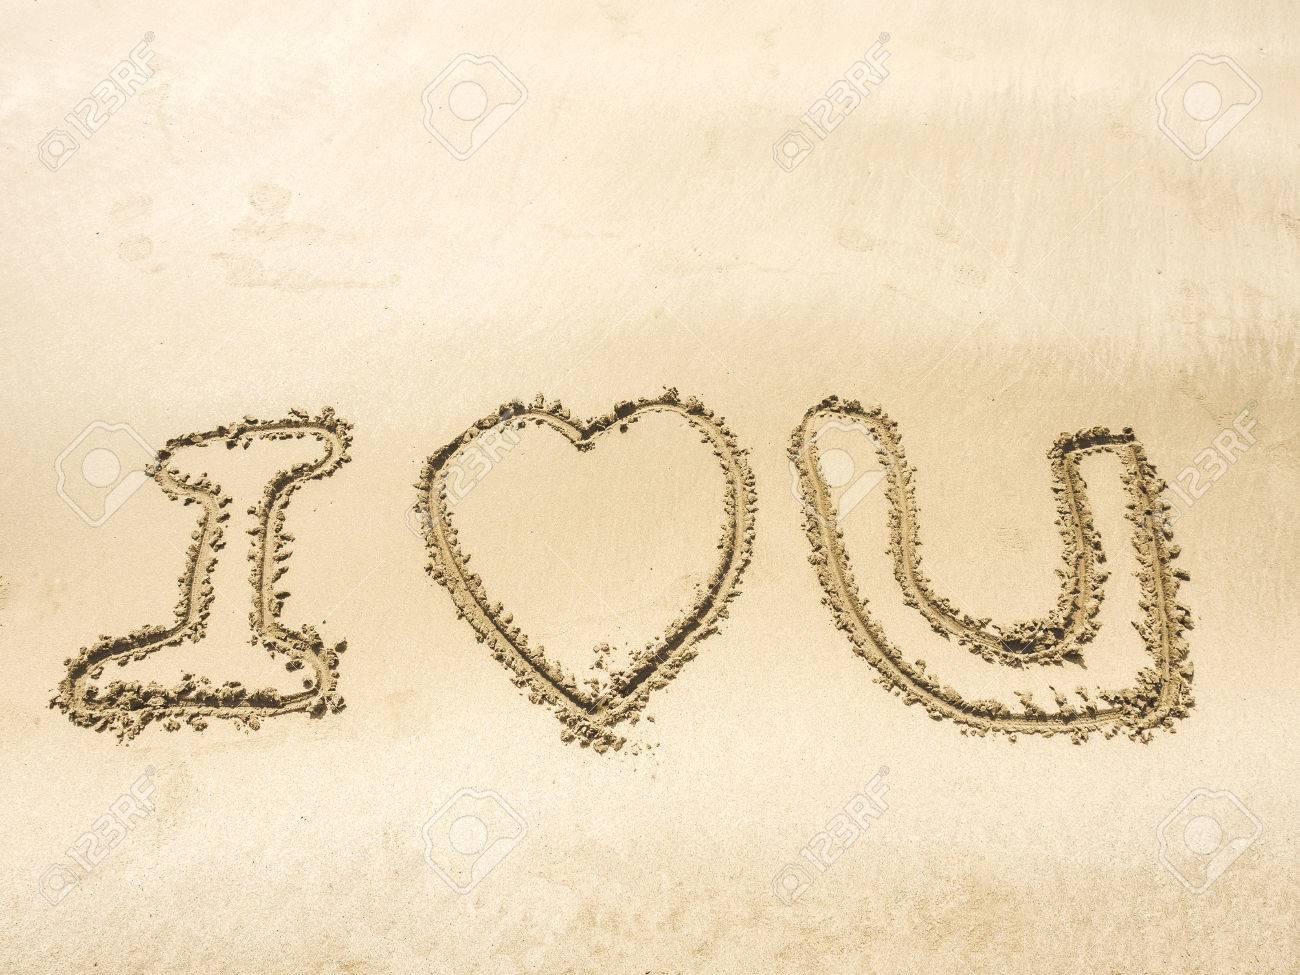 The Word I Love U Writing On Sand In The Sea Beach Light Stock